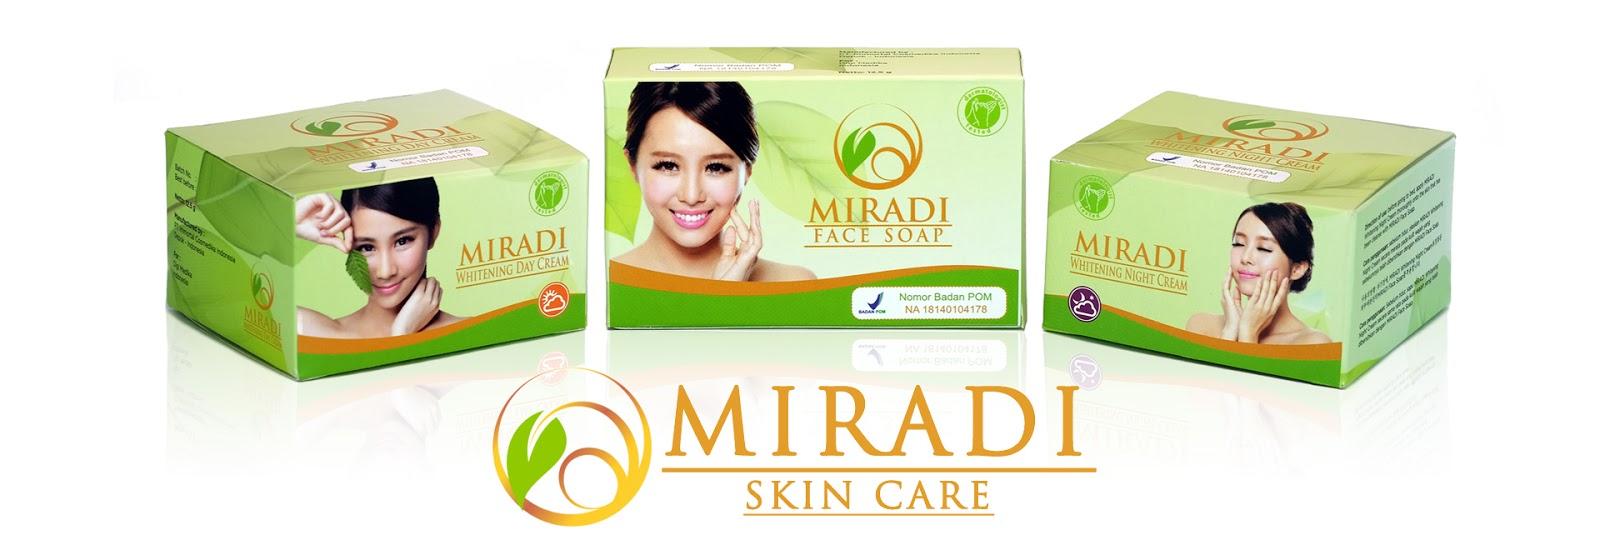 Paket Miradi Skincare Products